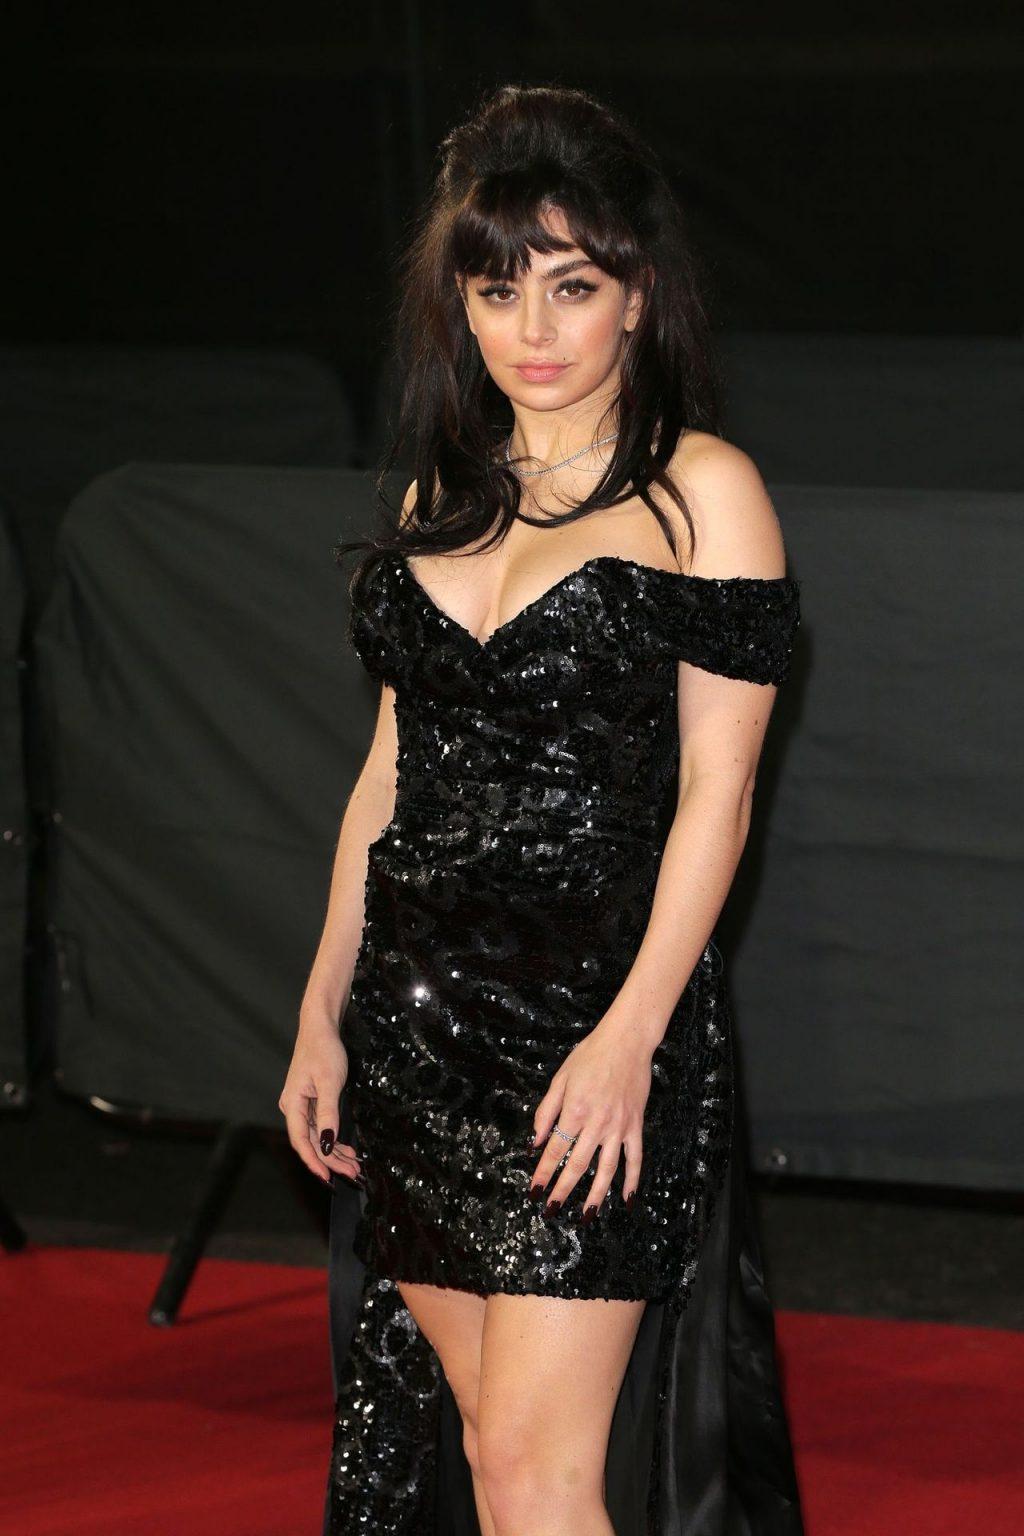 Charli XCX Sexy (36 Photos)